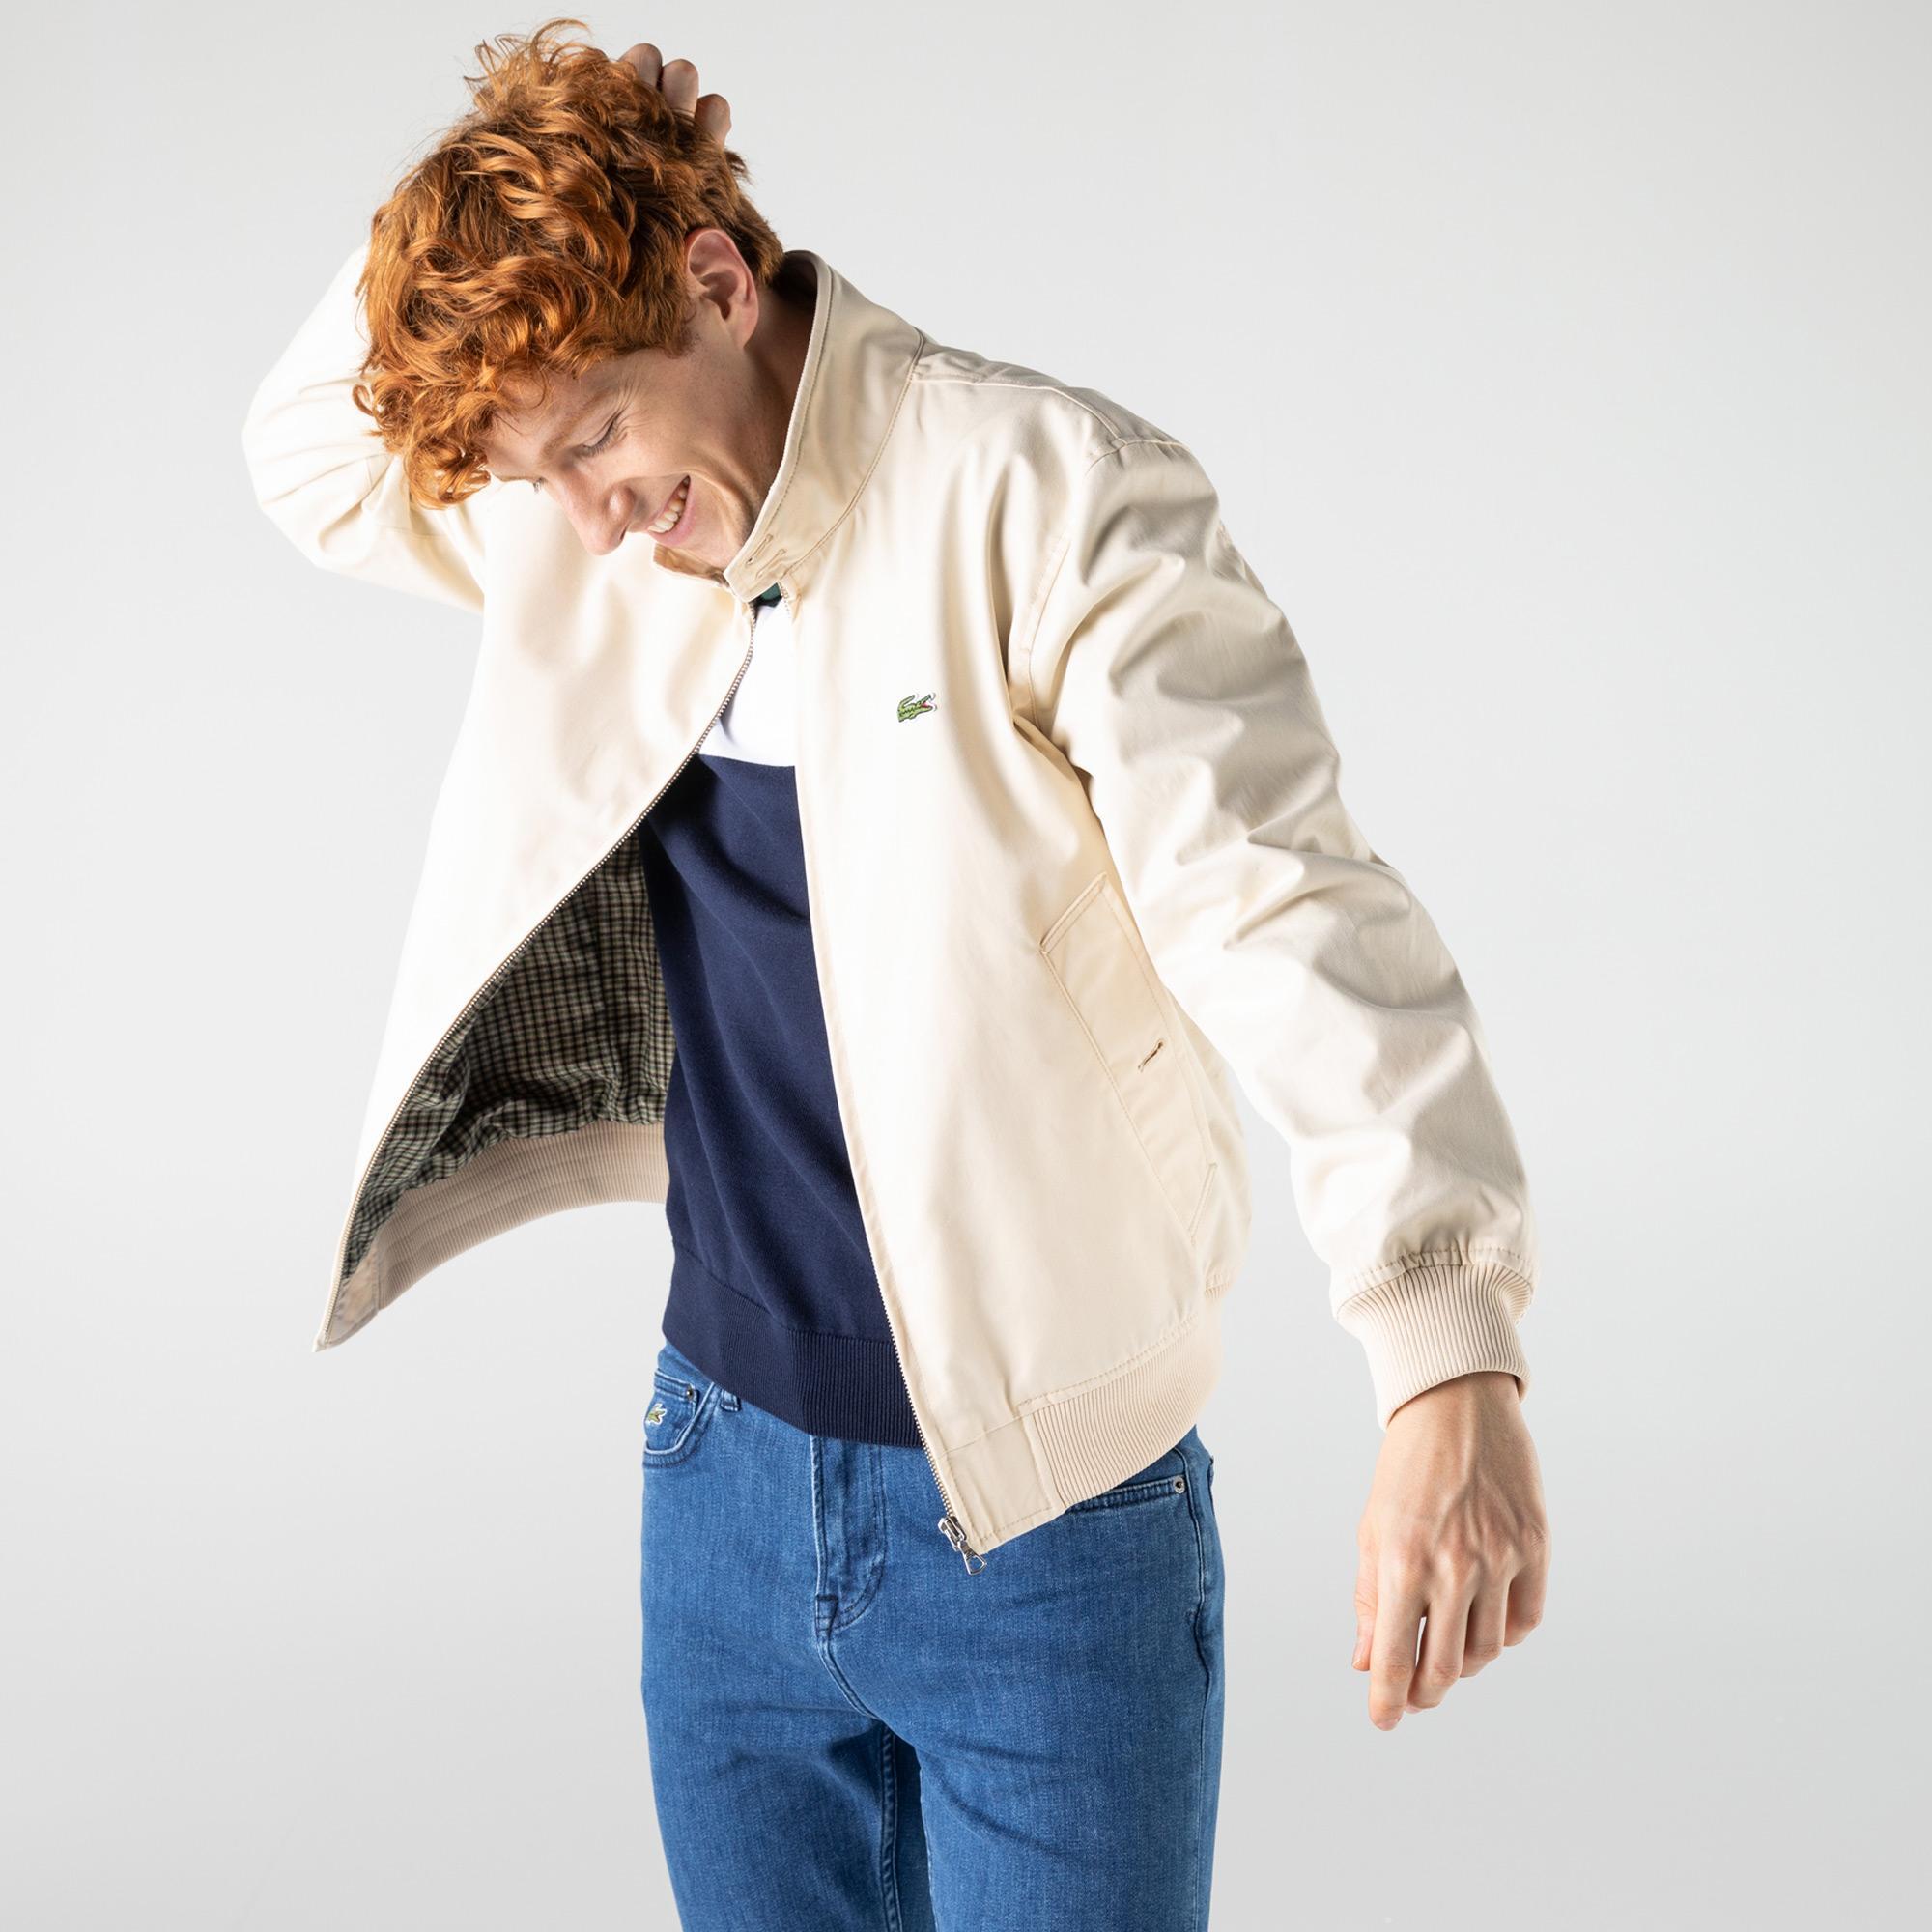 Lacoste Erkek Fermuarlı Krem Ceket